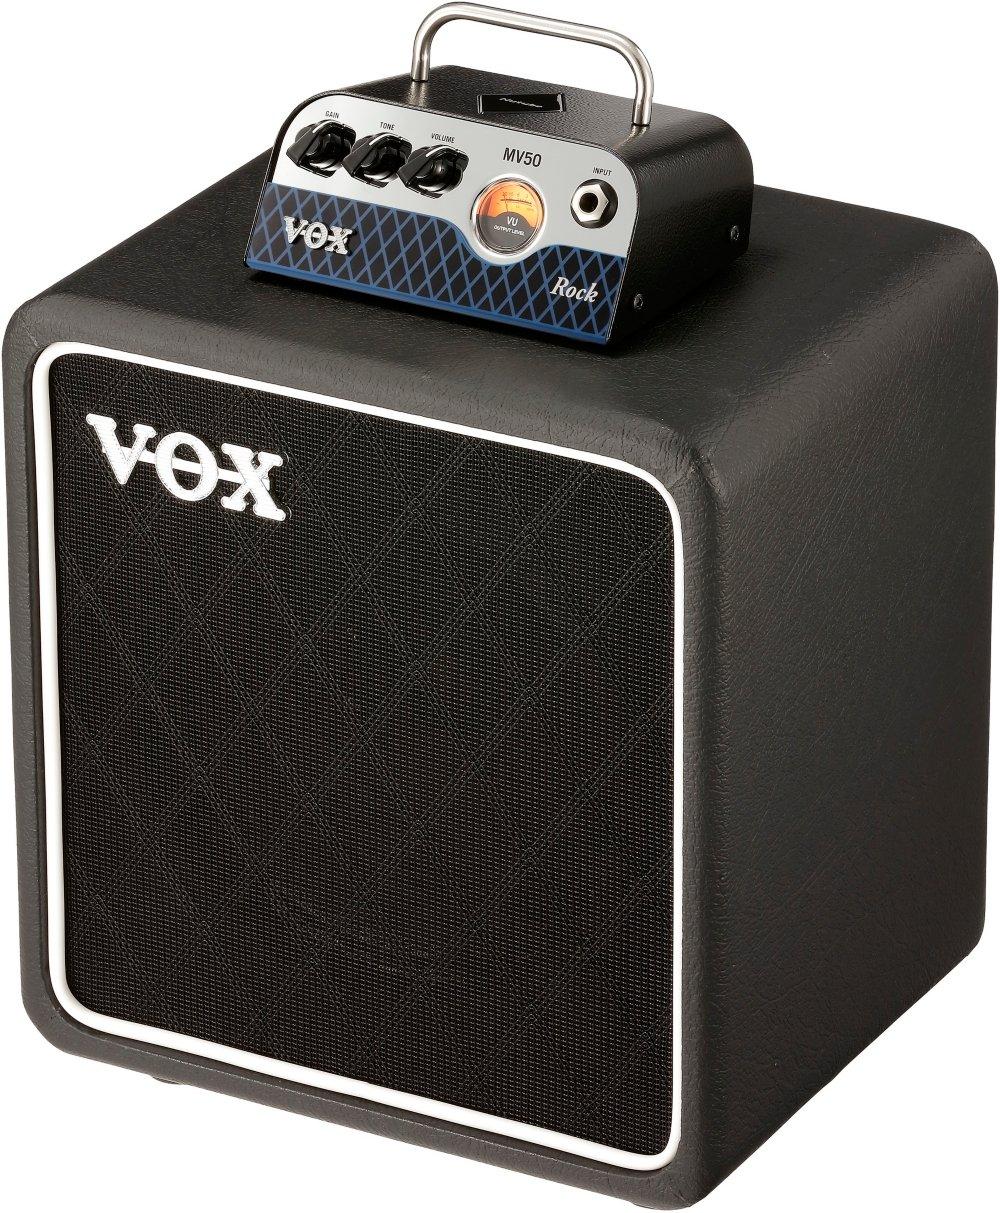 Vox MV50 Rock Set 50-watt Hybrid Tube Head with 1x8'' Cabinet